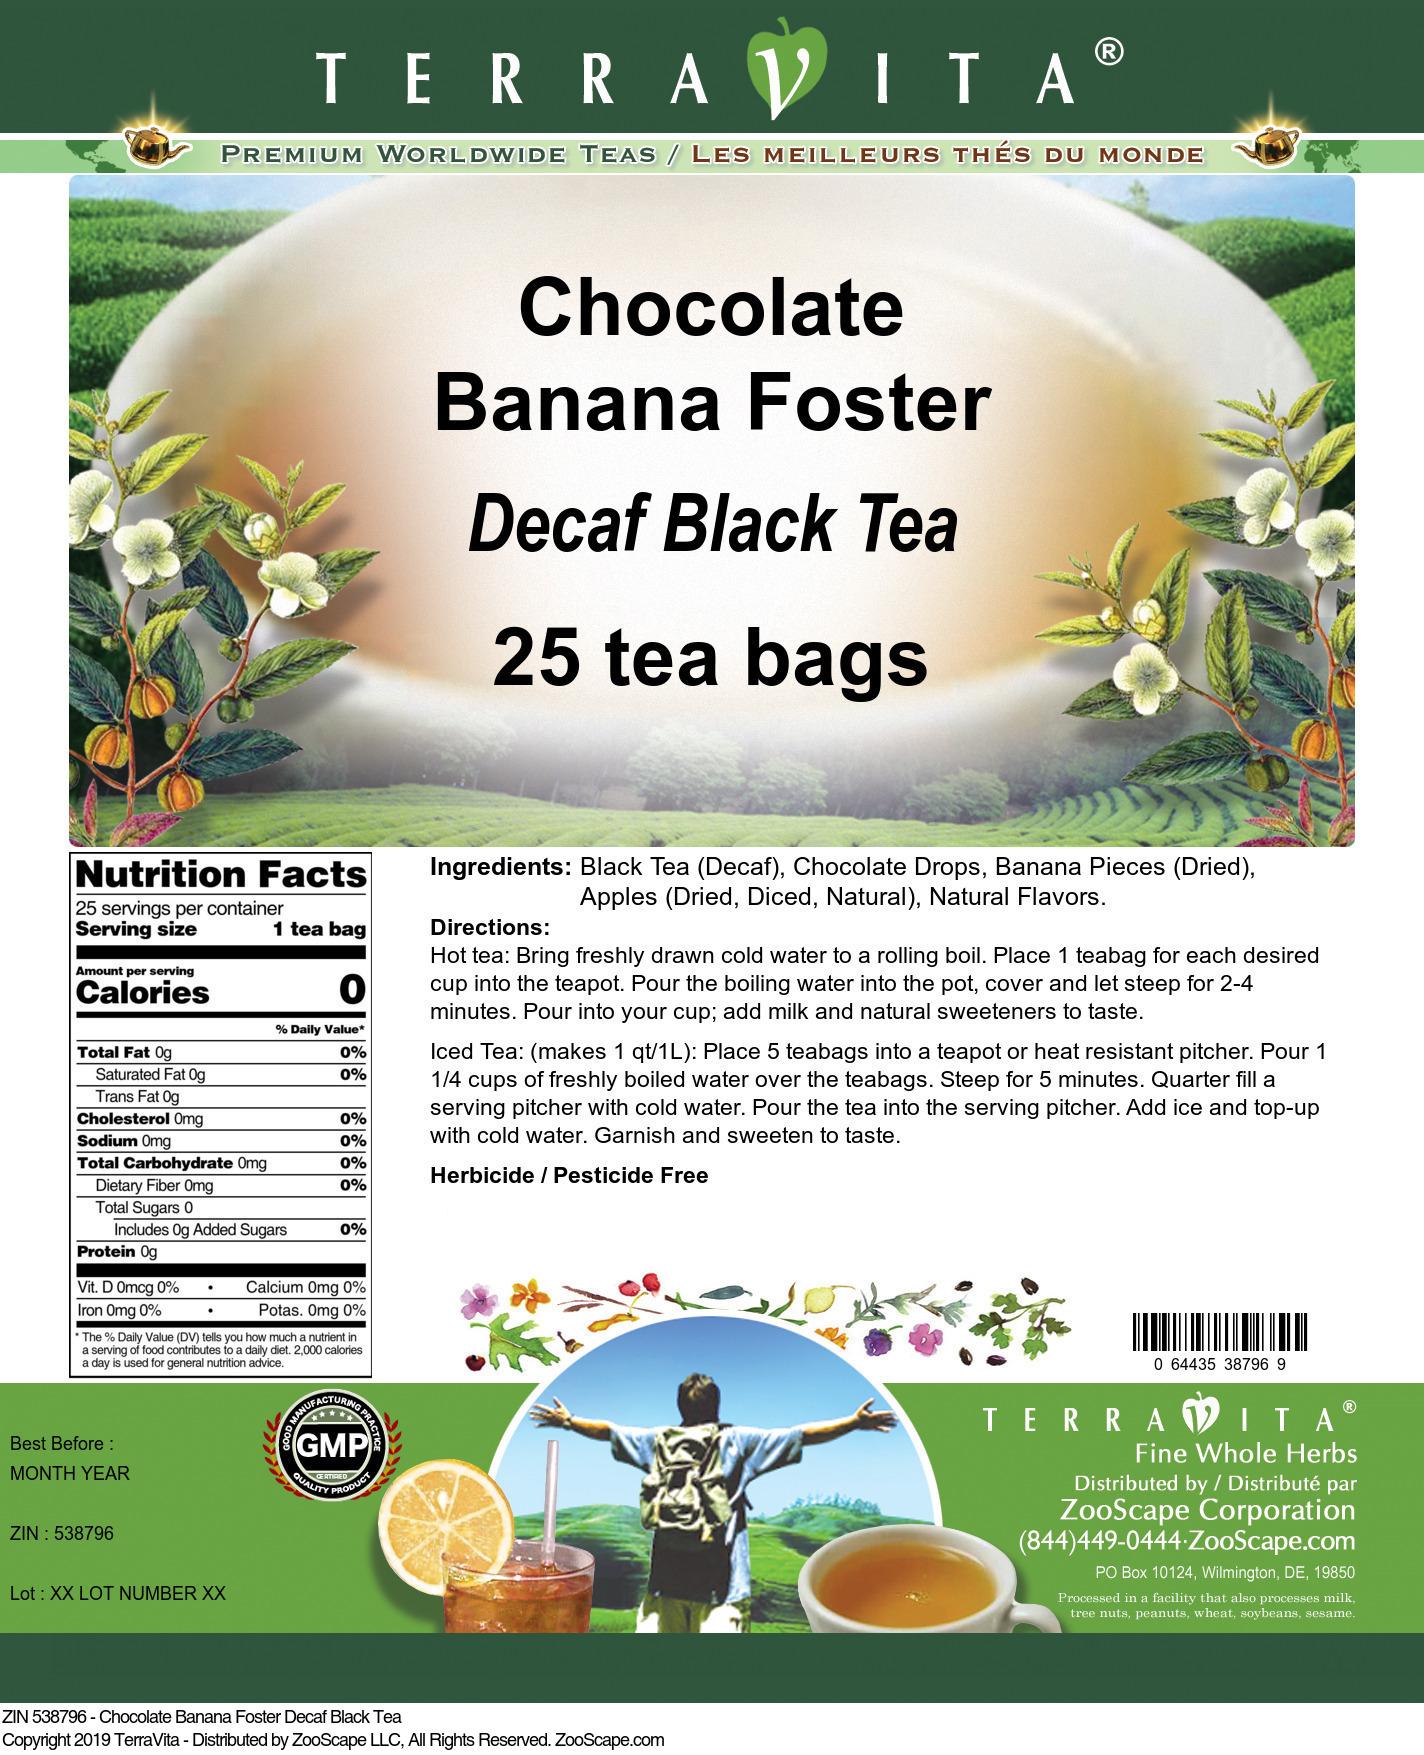 Chocolate Banana Foster Decaf Black Tea